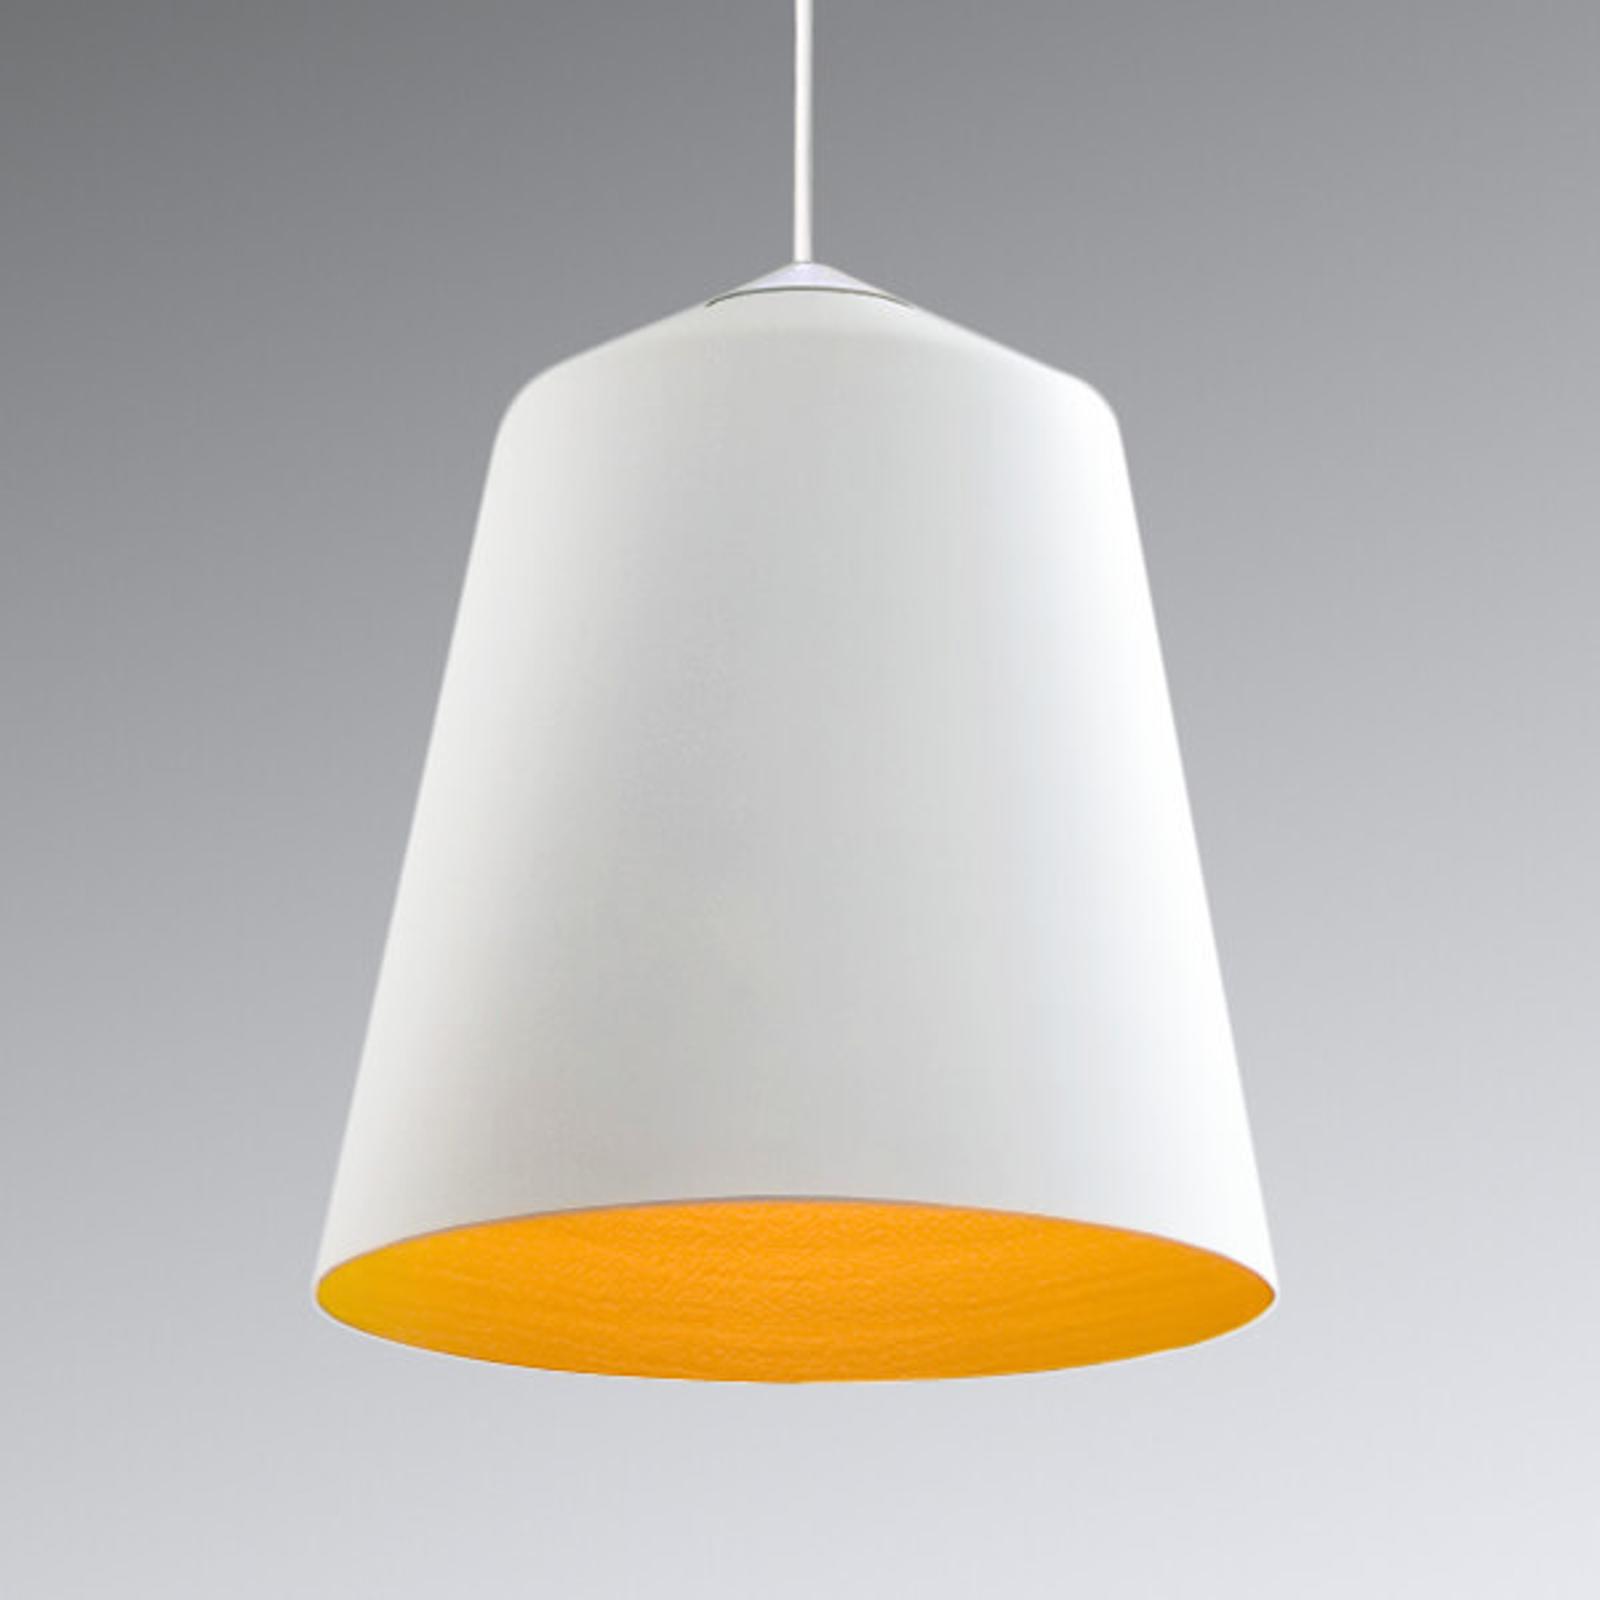 Innermost Circus - hanglamp, wit-goud, 36 cm